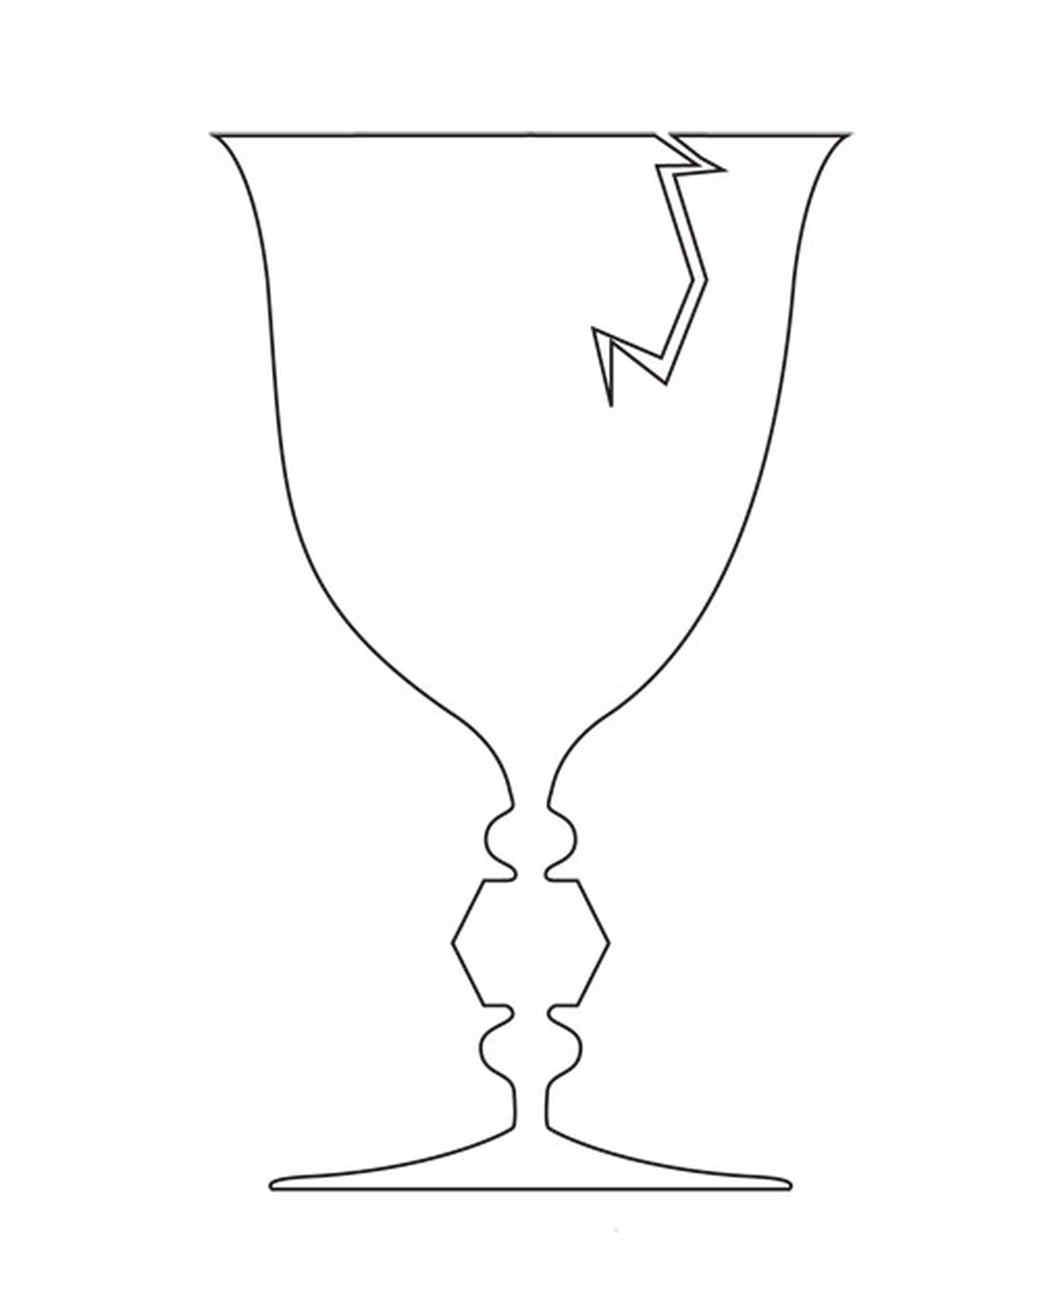 la_1007_pumpkinwkbk_wineglass.jpg